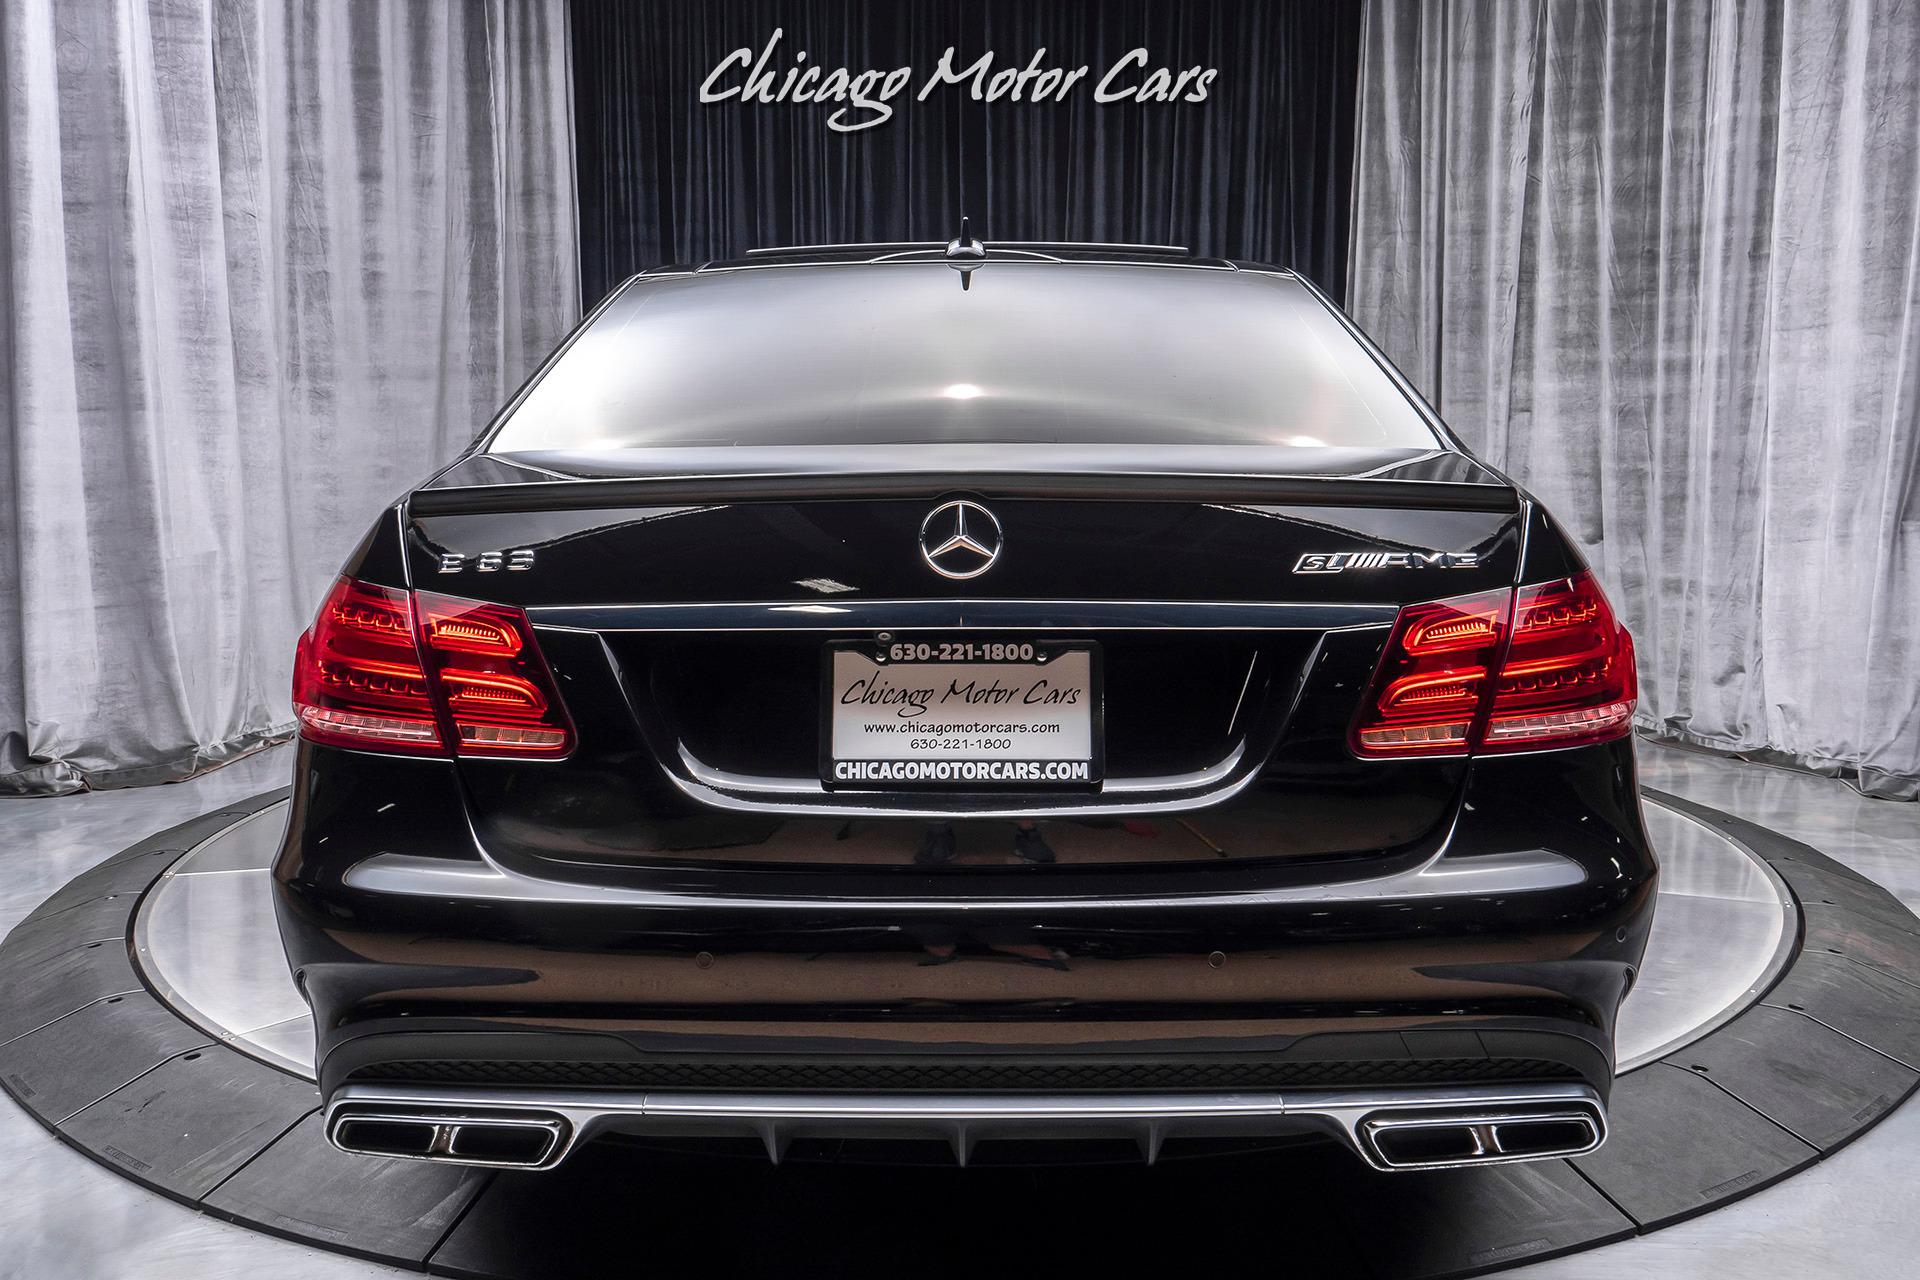 Used-2016-Mercedes-Benz-E63-S-AMG-4Matic-Sedan-RENNTECH-Upgrades